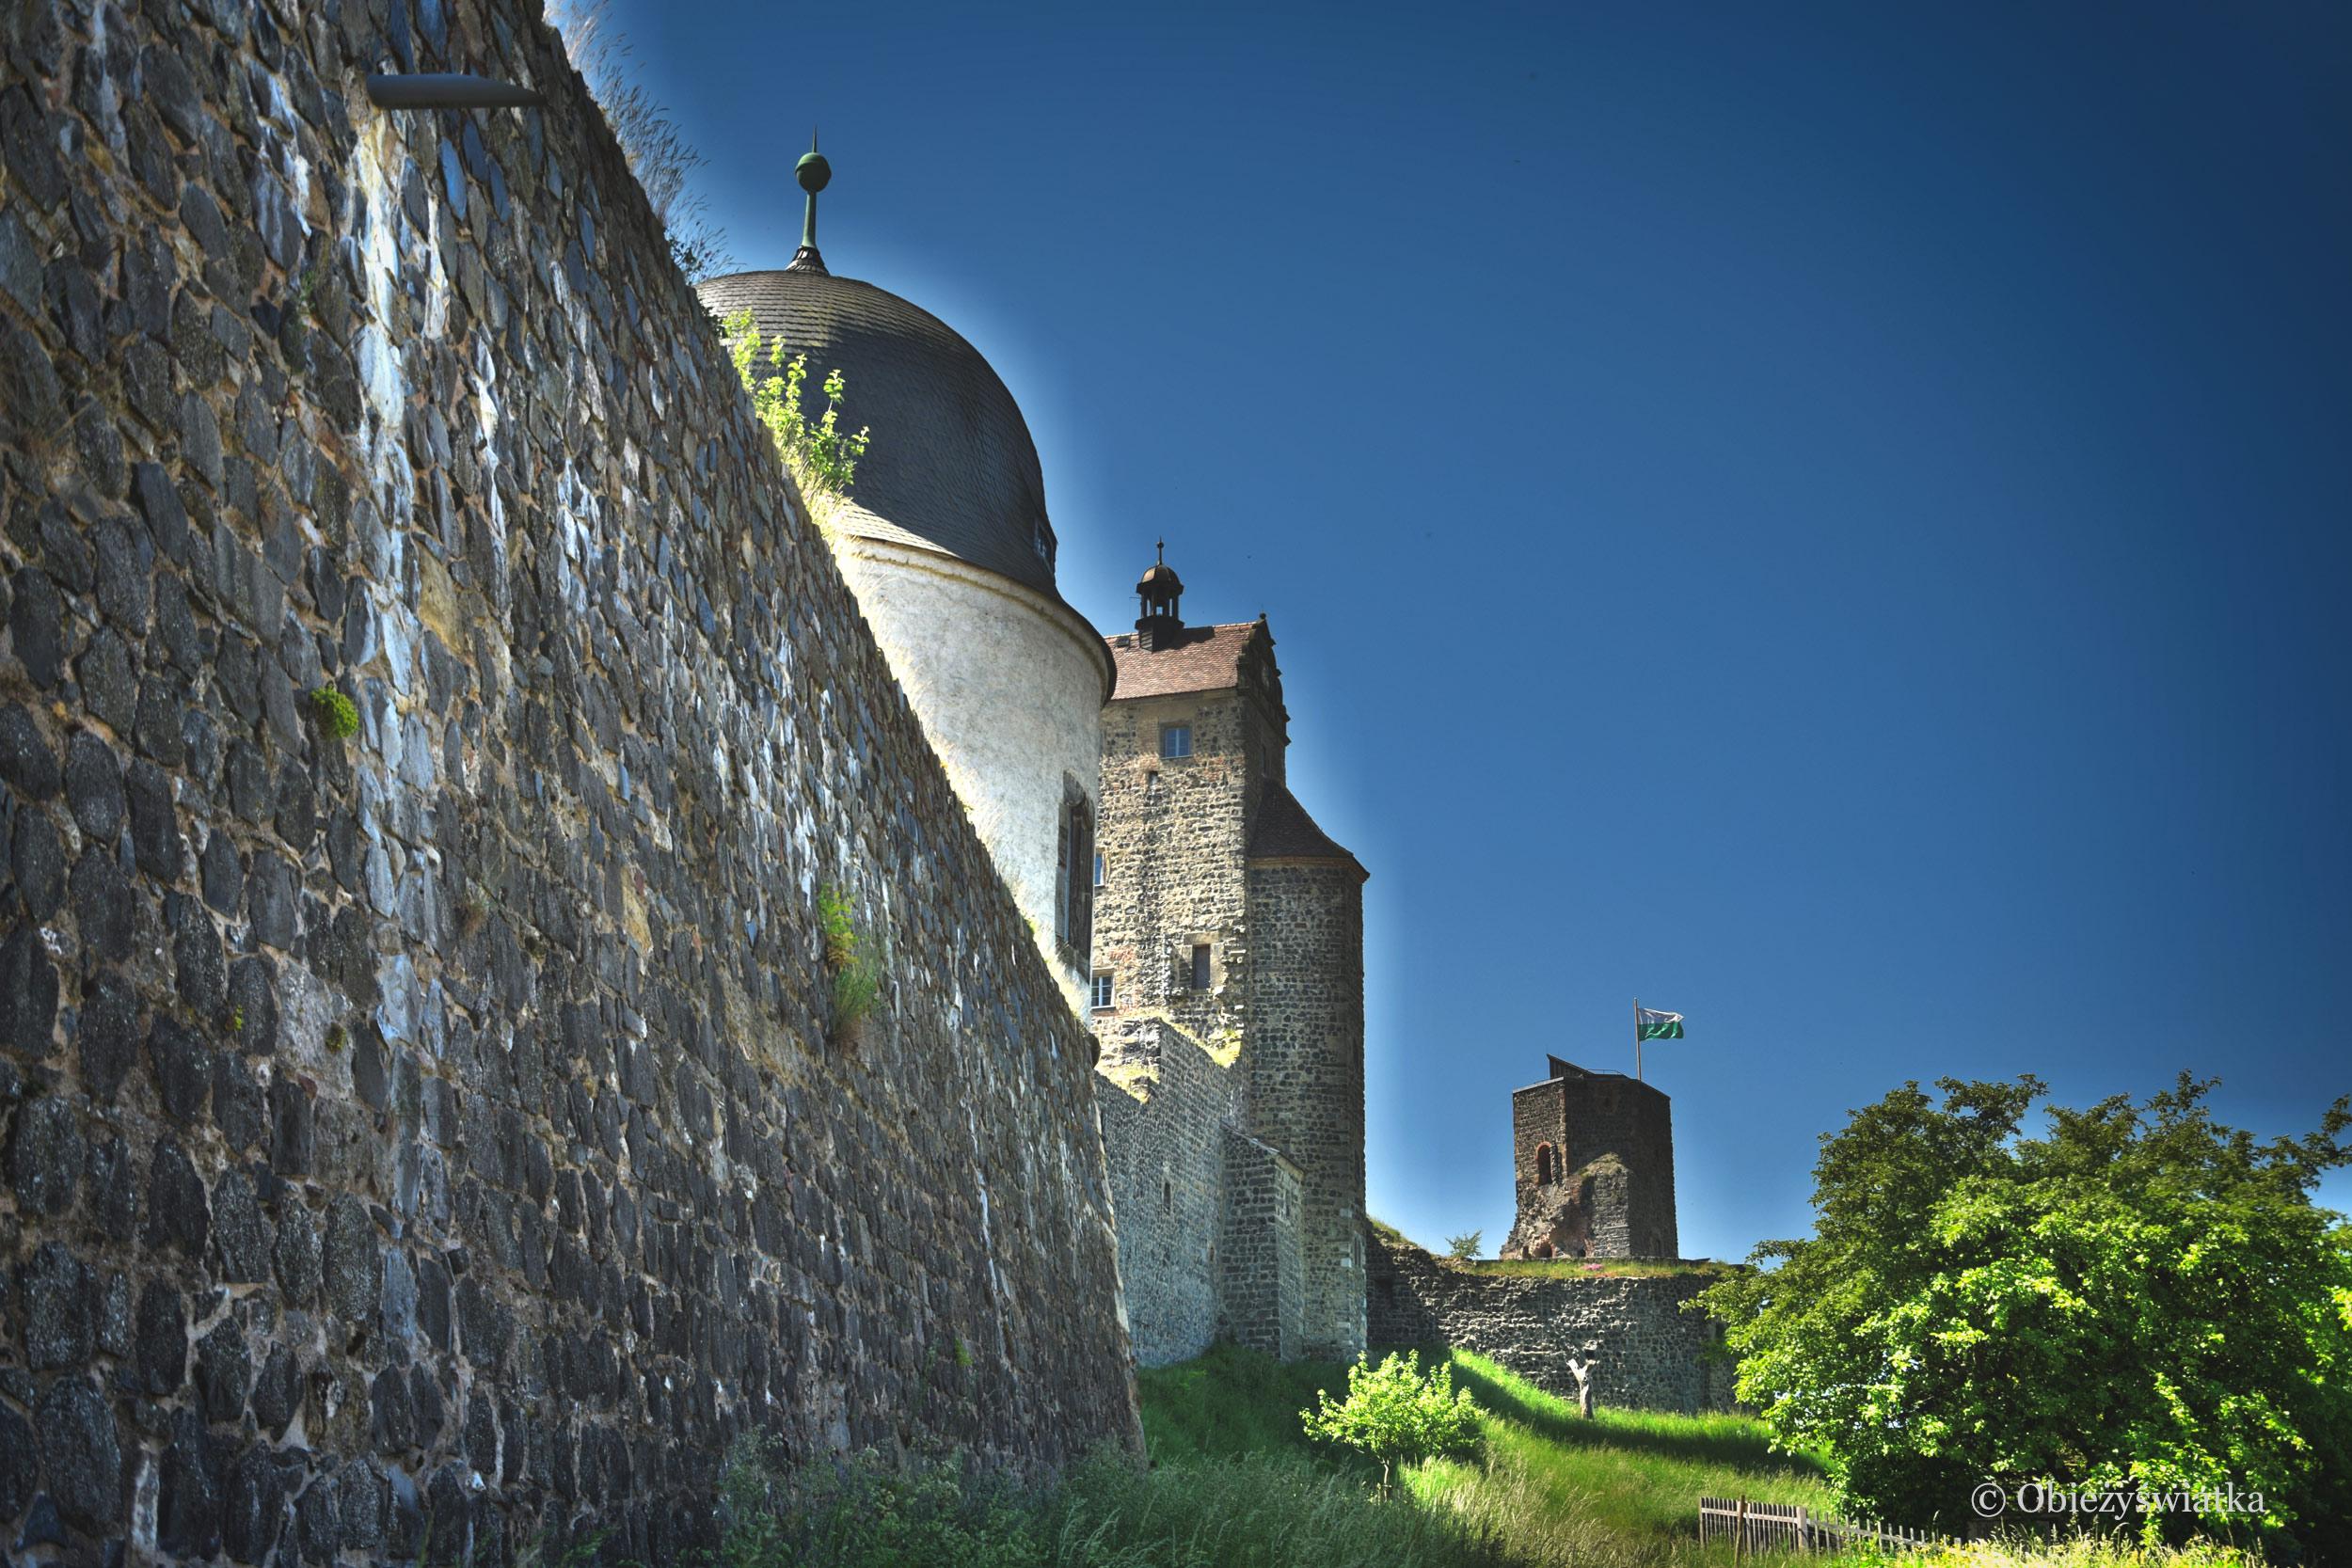 Wokół zamku Stolpen